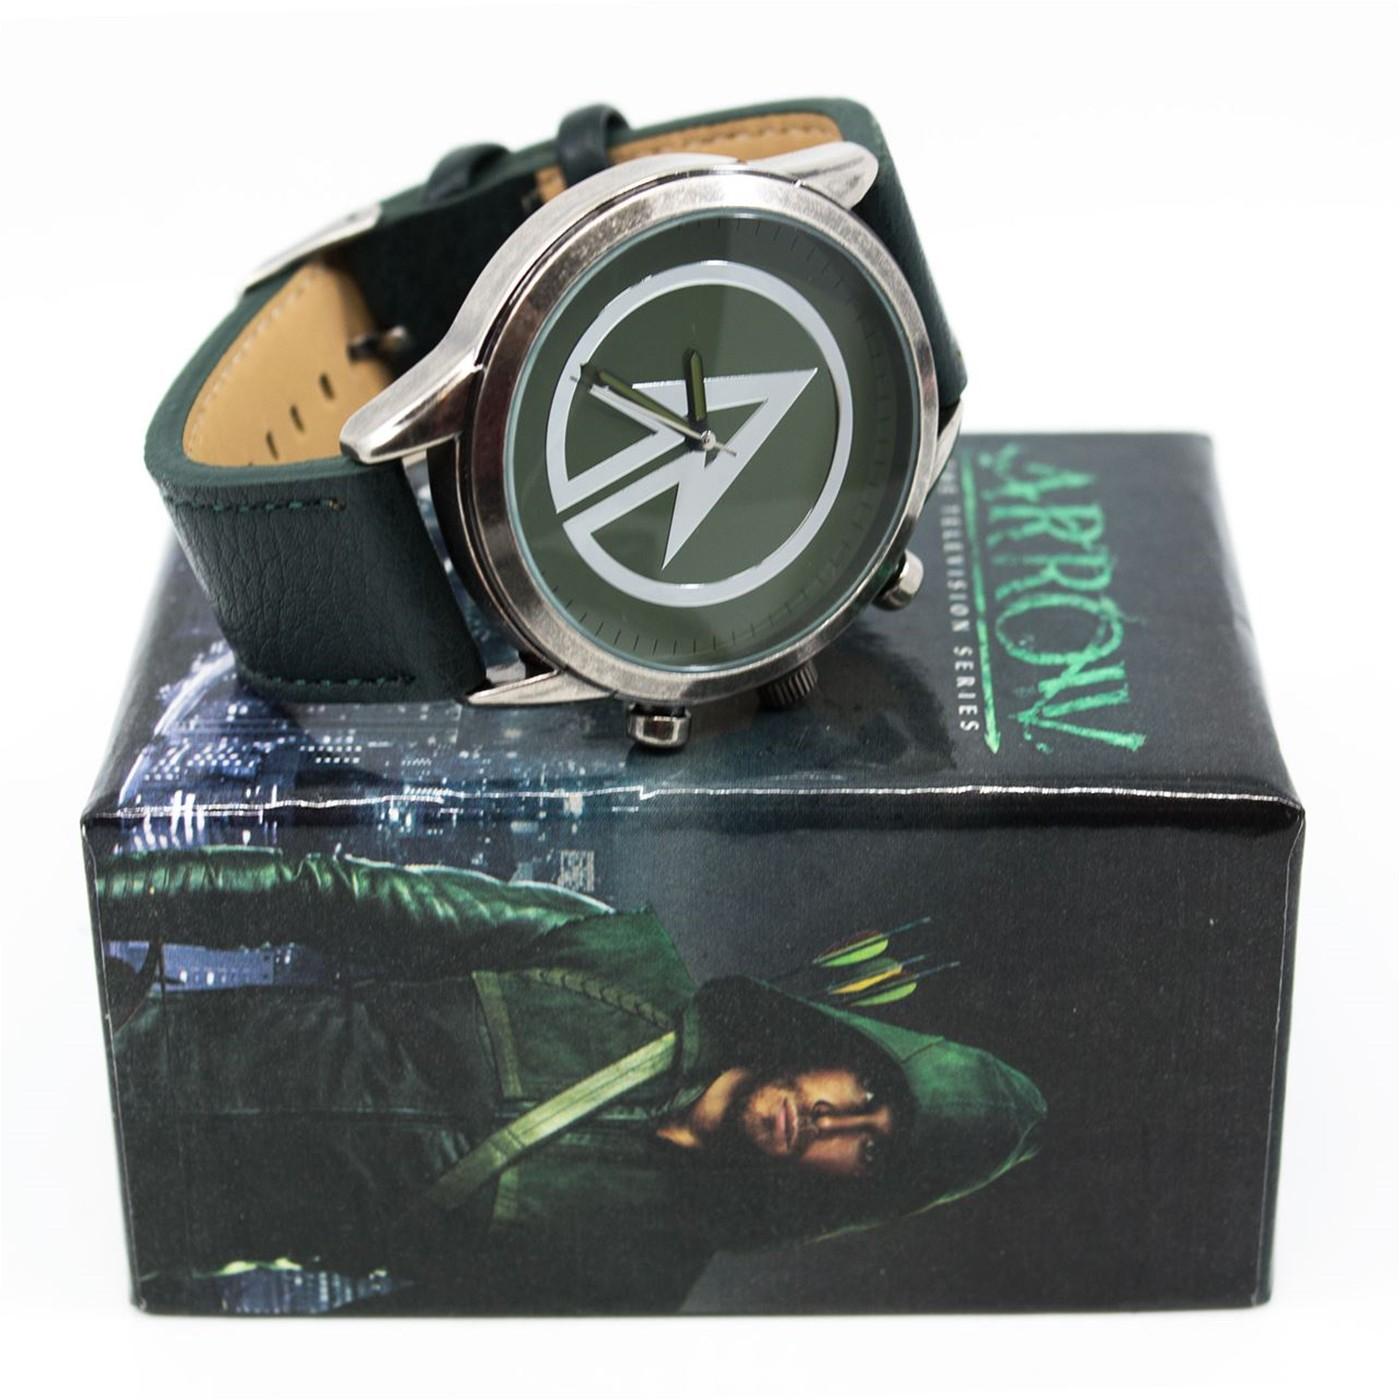 Green Arrow Symbol Watch with Adjustable Strap